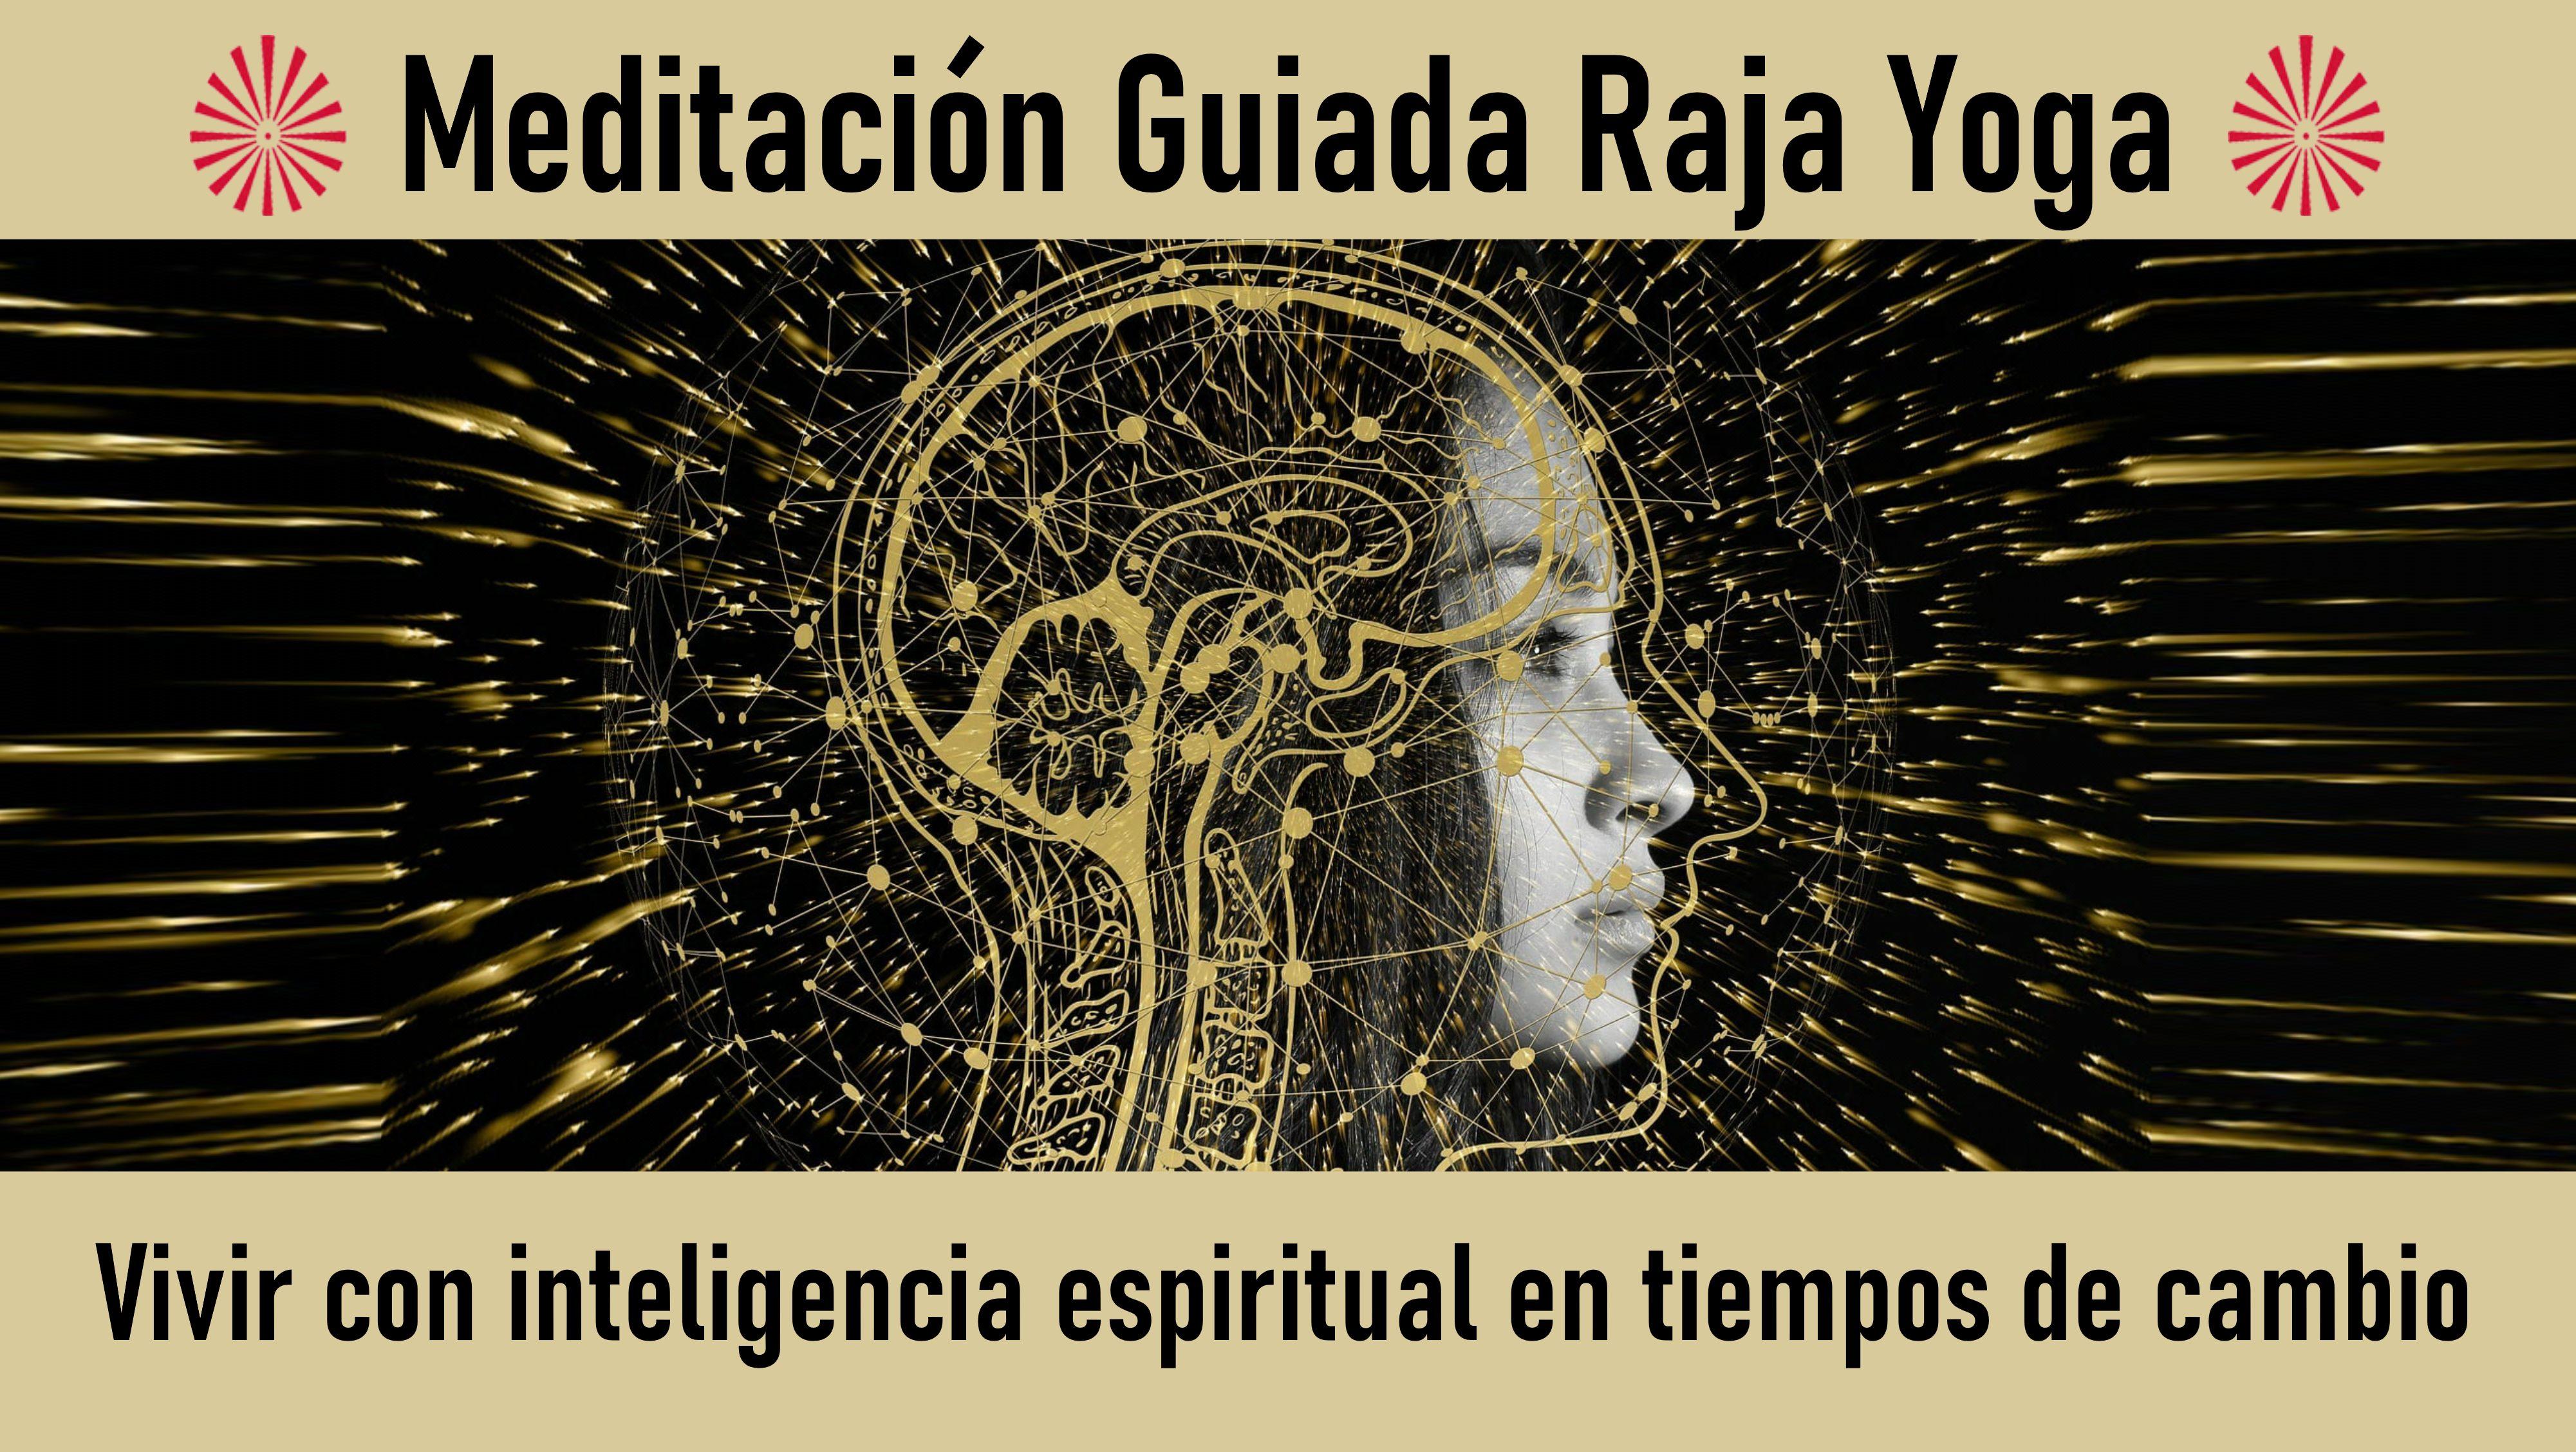 Meditación Raja Yoga: Vivir con inteligencia espiritual en tiempos de cambio (21 Julio 2020) On-line desde Mallorca